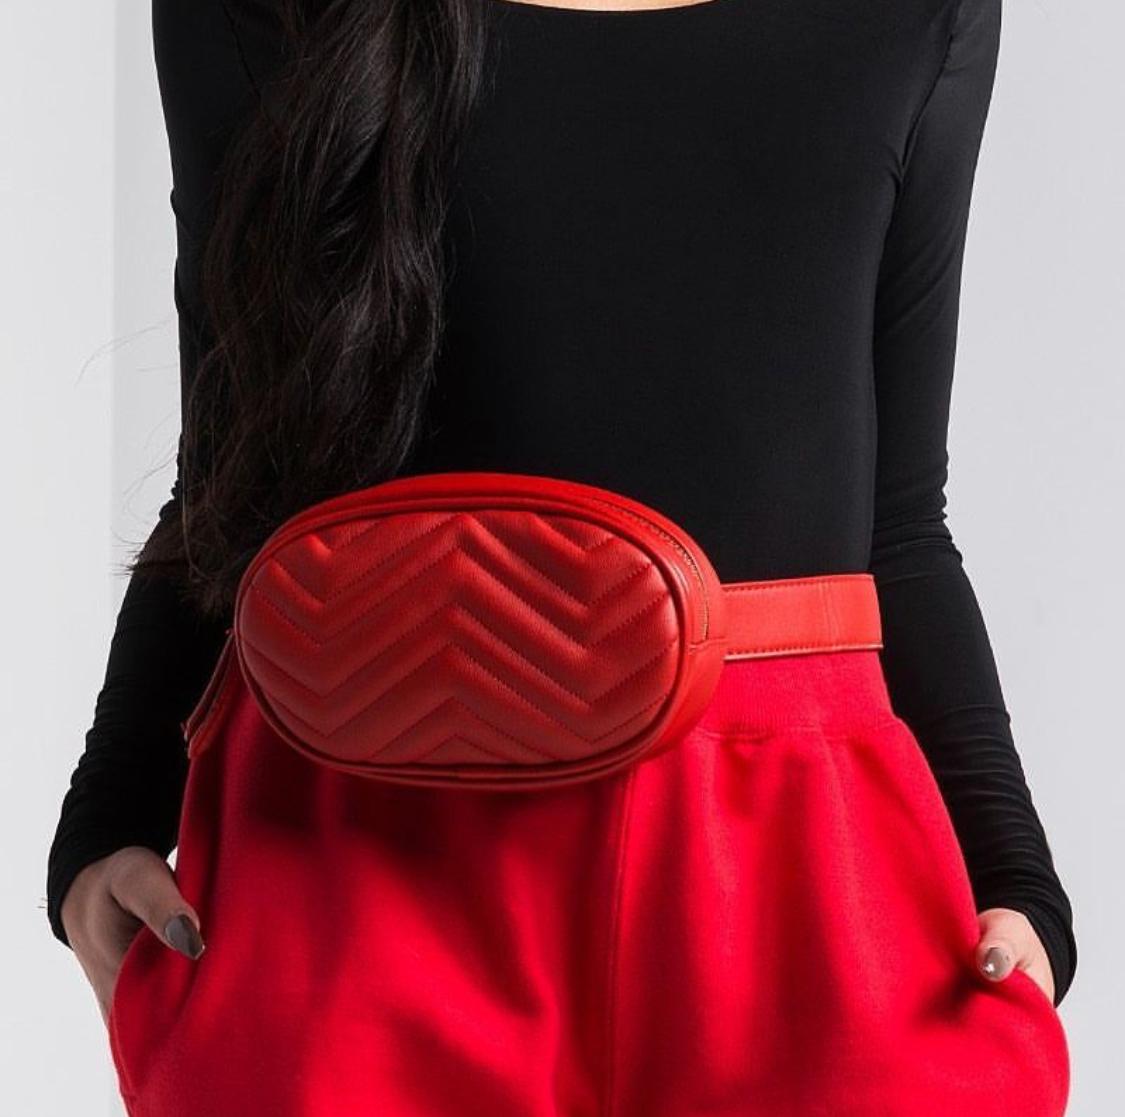 1c68b6c16f1cda Gucci GG Marmont Small Belt Bag $1100 · Faux Leather Fanny Pack $15.90  (Similiar)